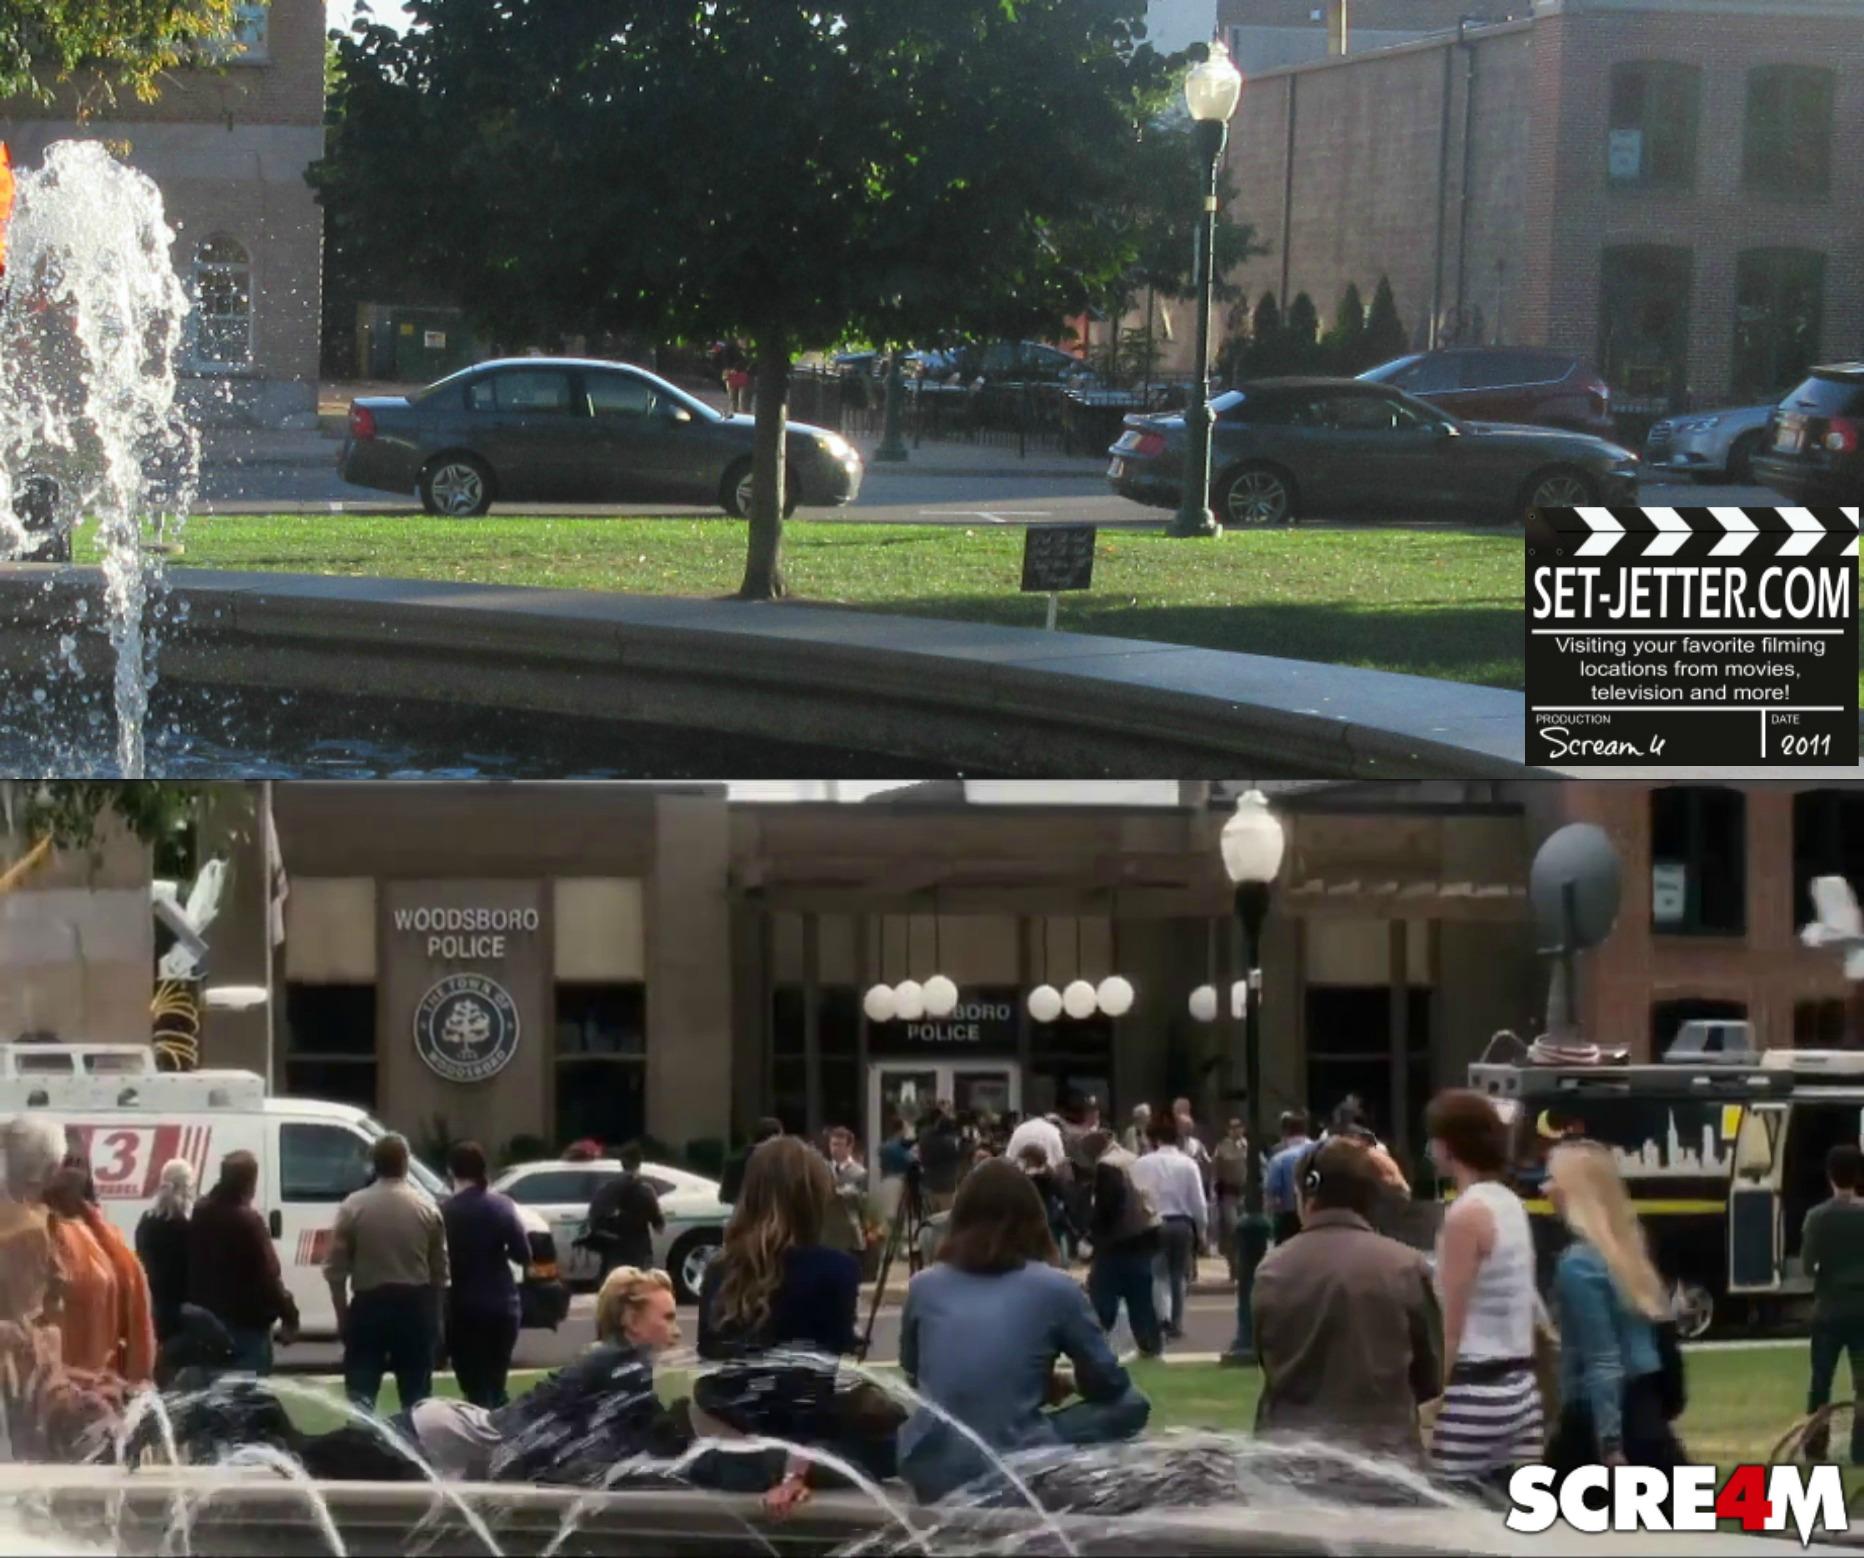 Scream4 comparison 151.jpg